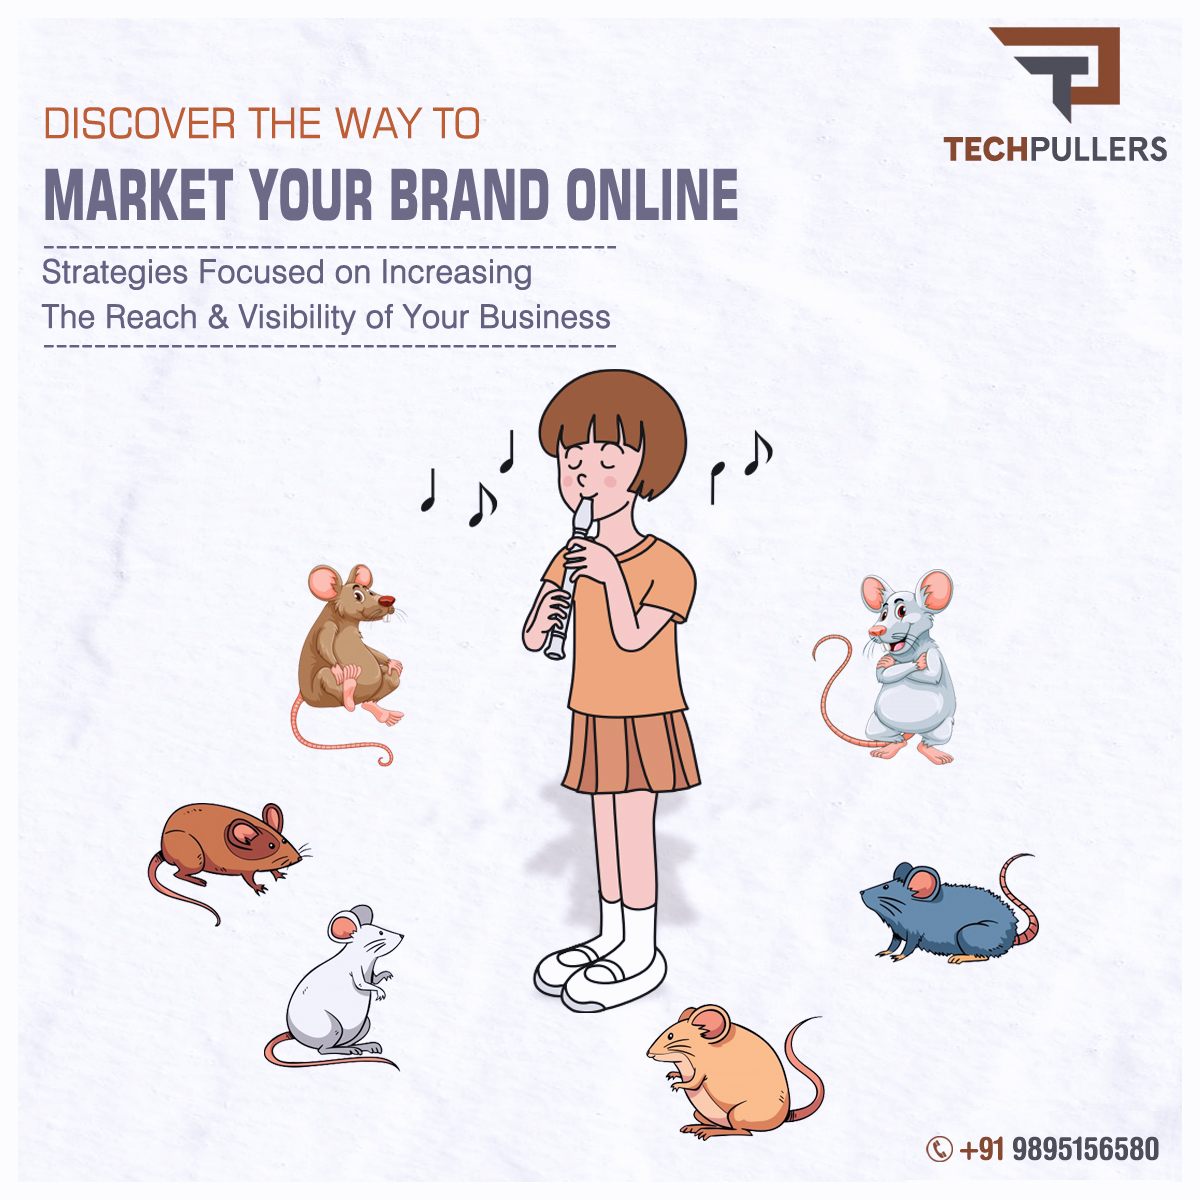 Improve online reputation through digital marketing for business growth